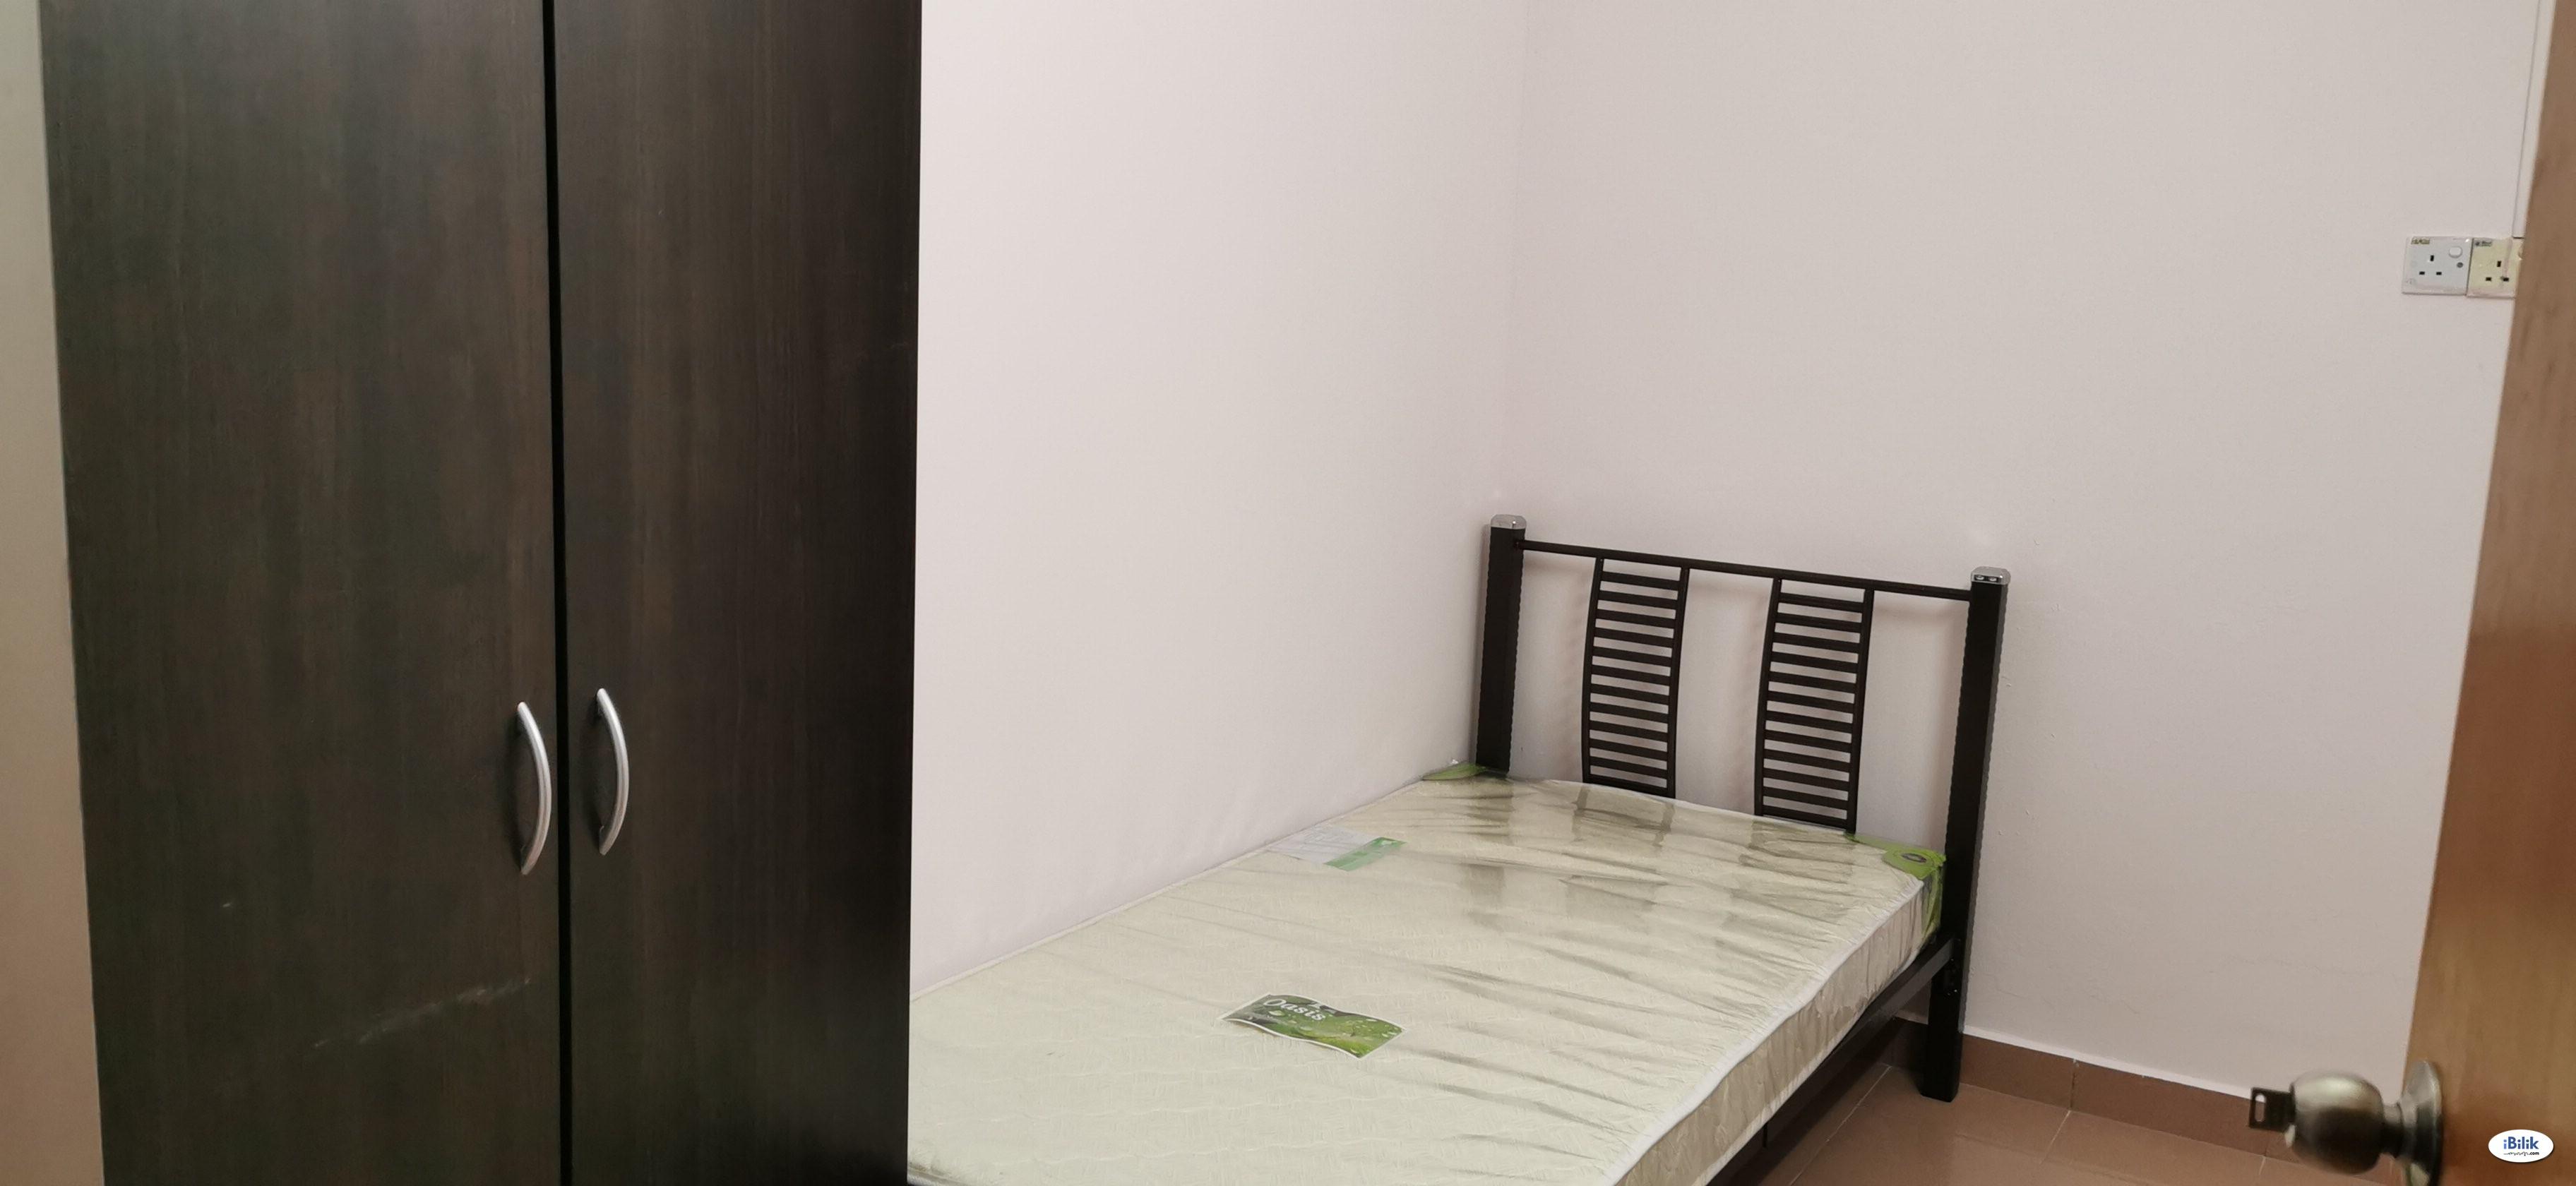 NICE SEMI D-Private Room Super Hot Location Tuanku Jaafar FULLY FURNISED